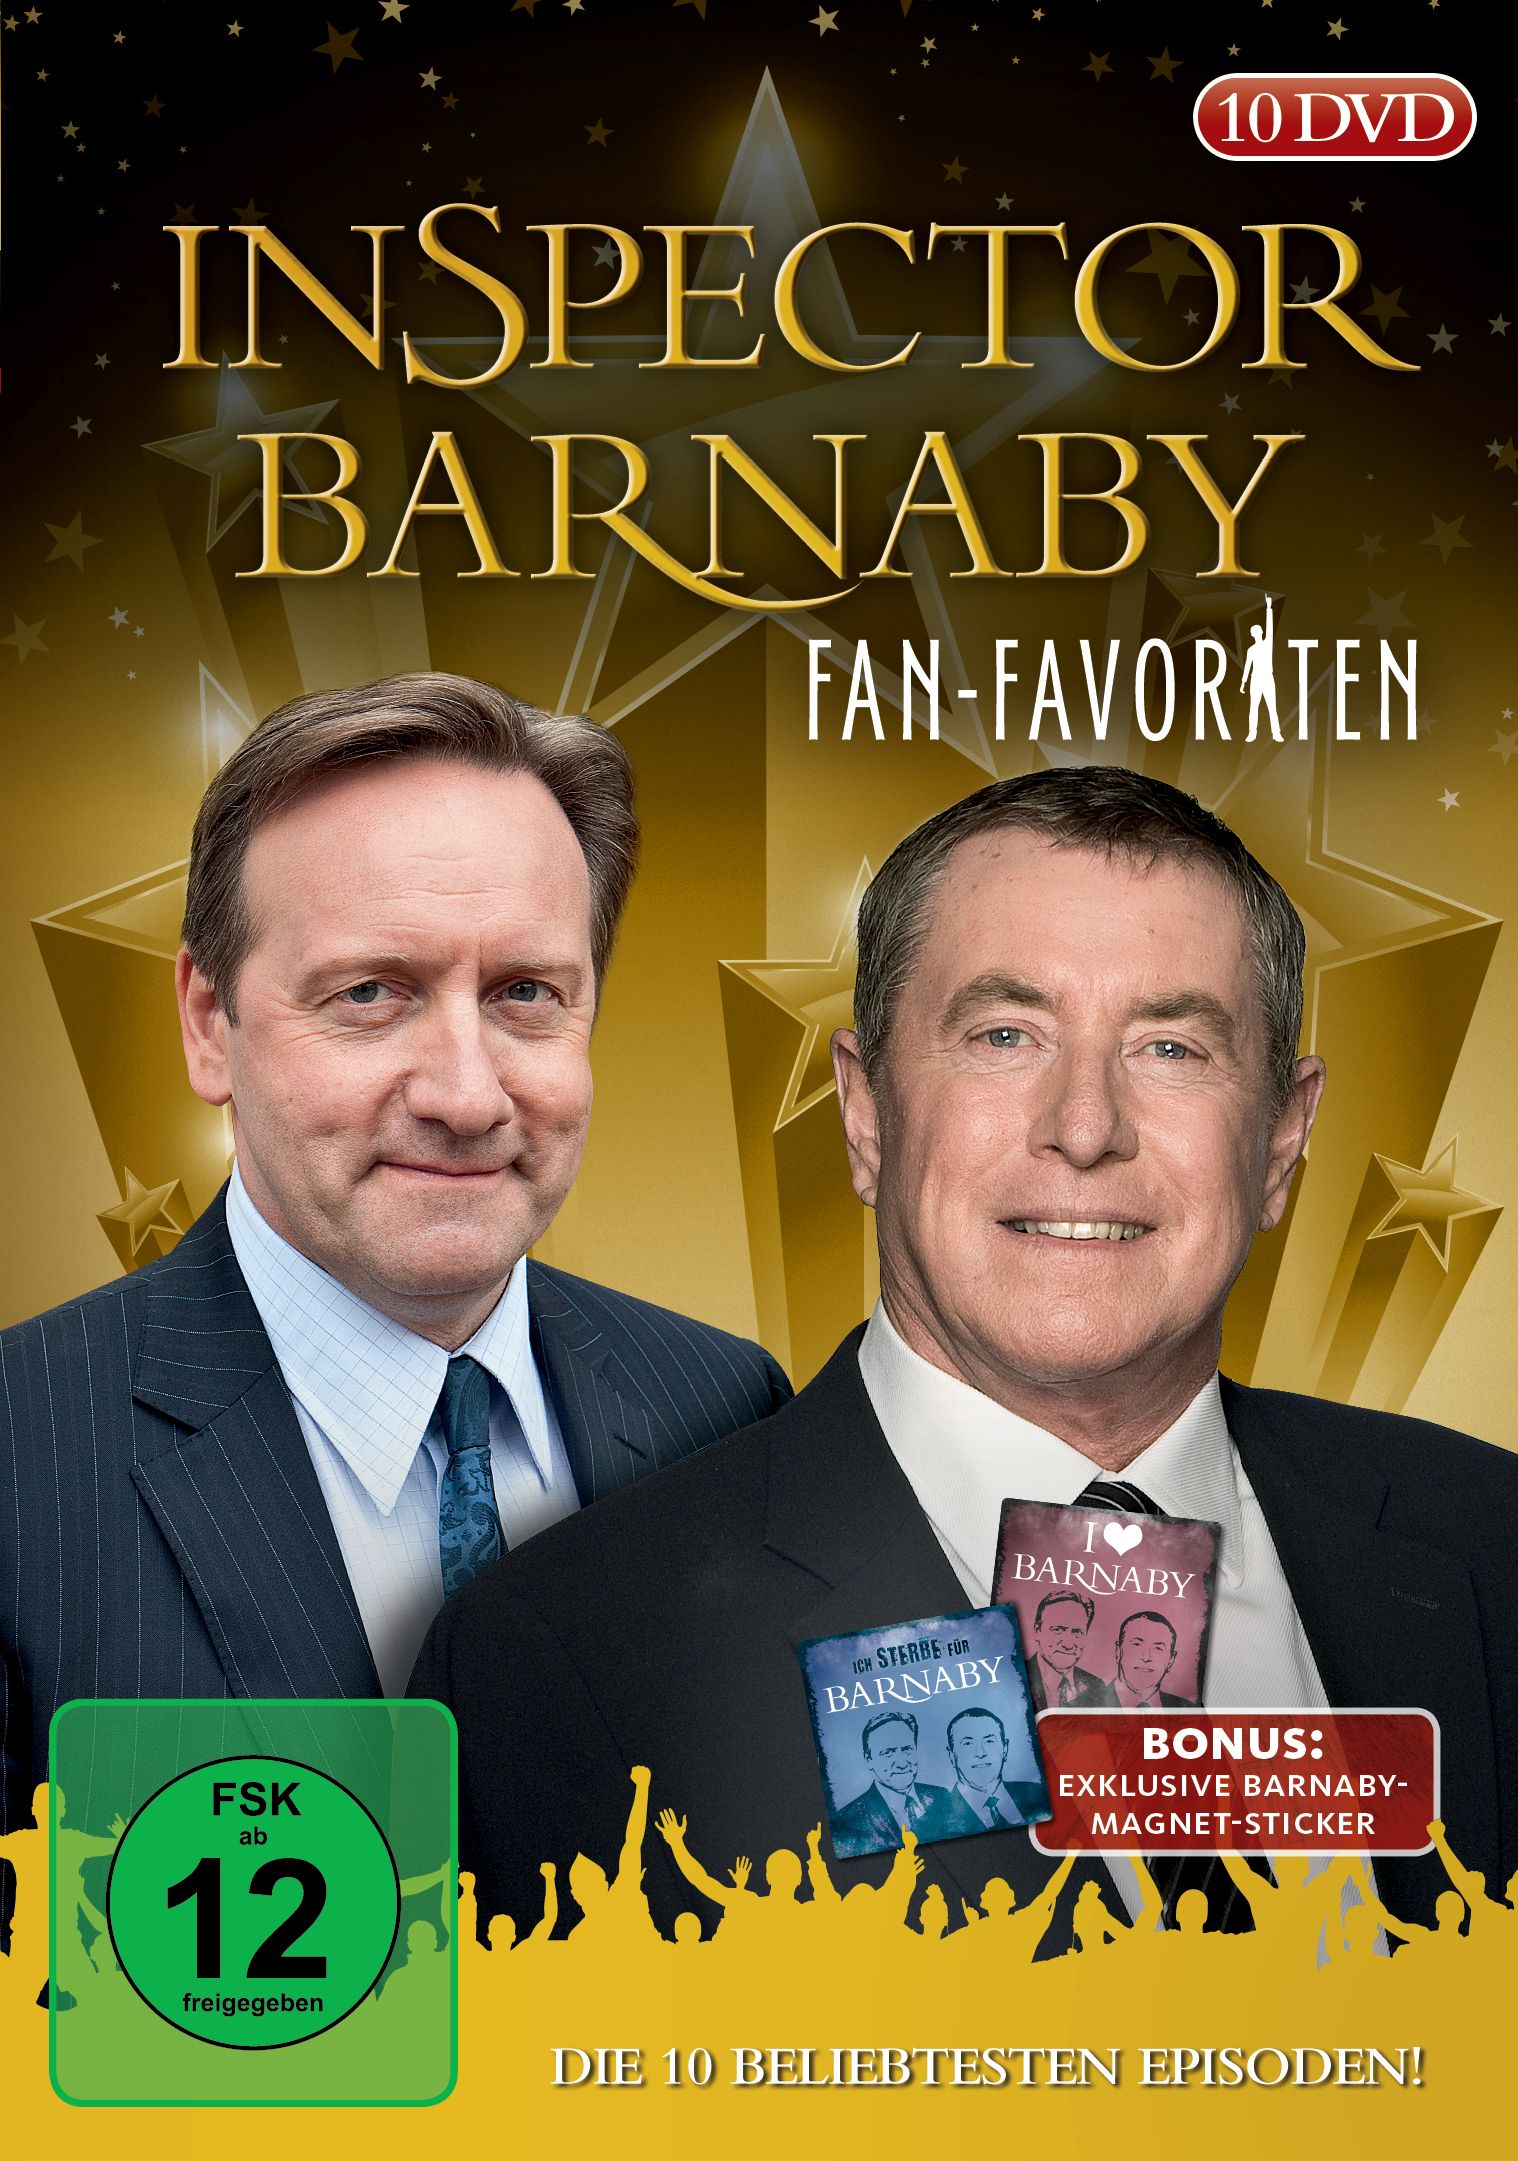 Youtube Inspector Barnaby Böse Kleine Welt